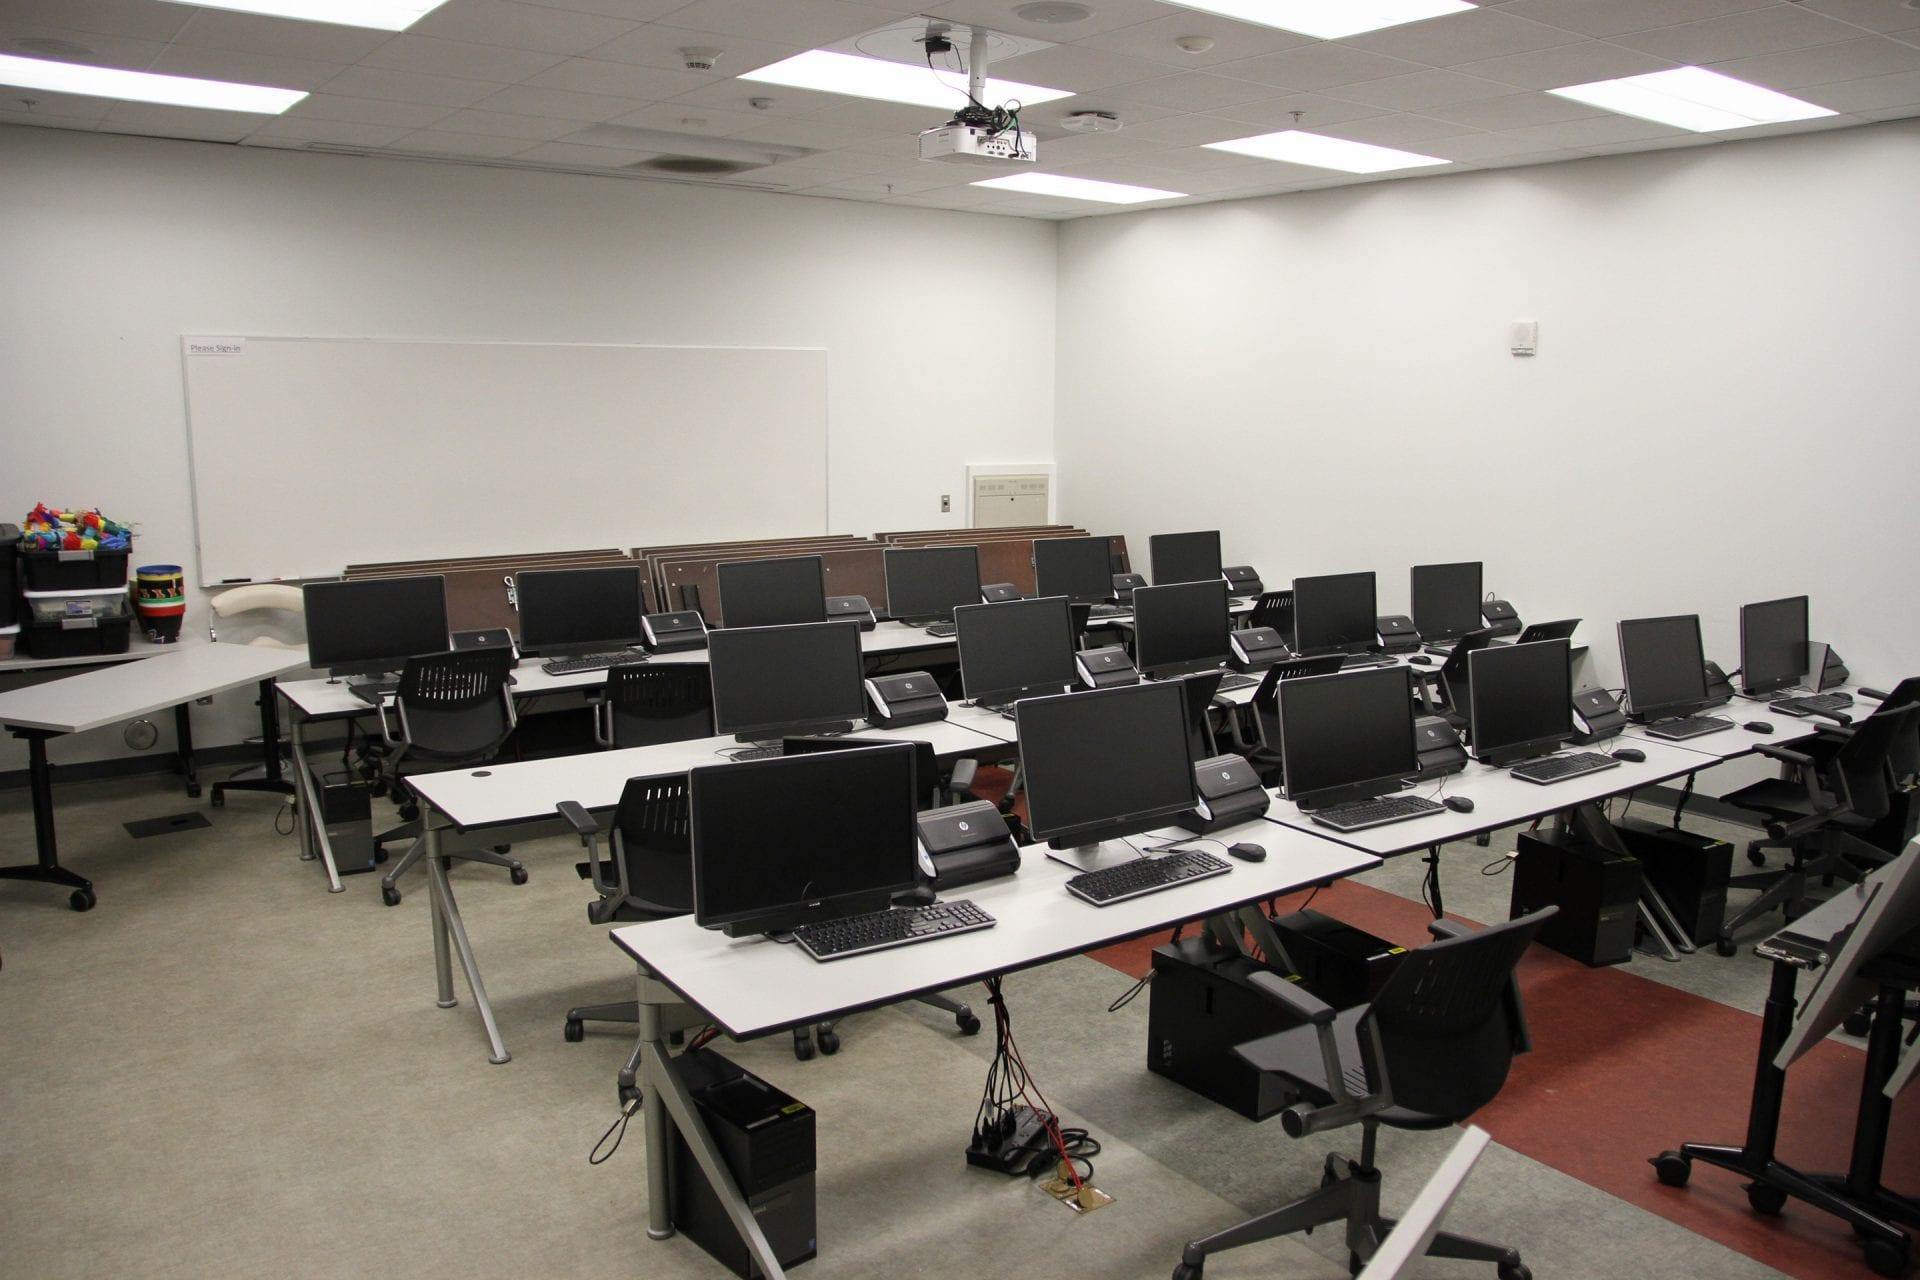 Room of public computers